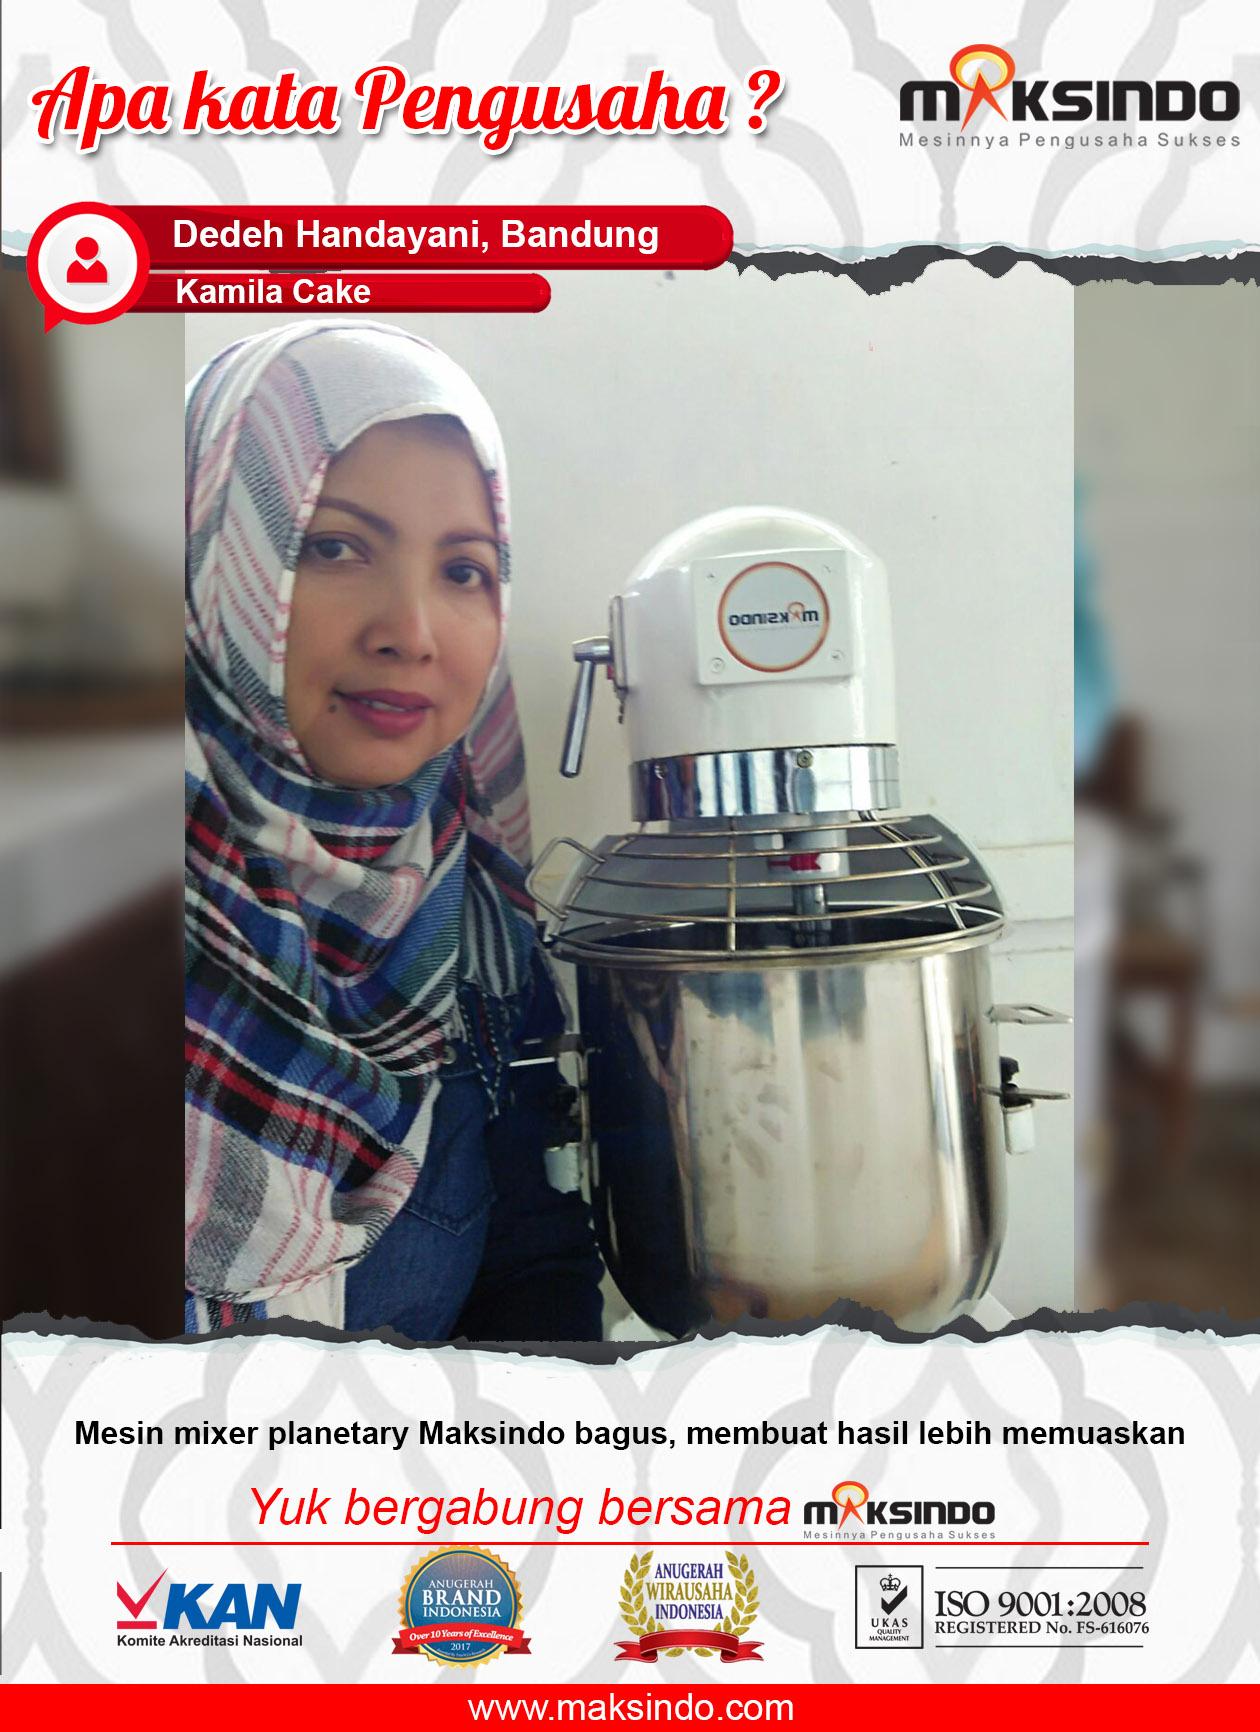 Camila Cake : Dengan MIxer Planetary Maksindo Usaha Saya Semakin Menguntungkan